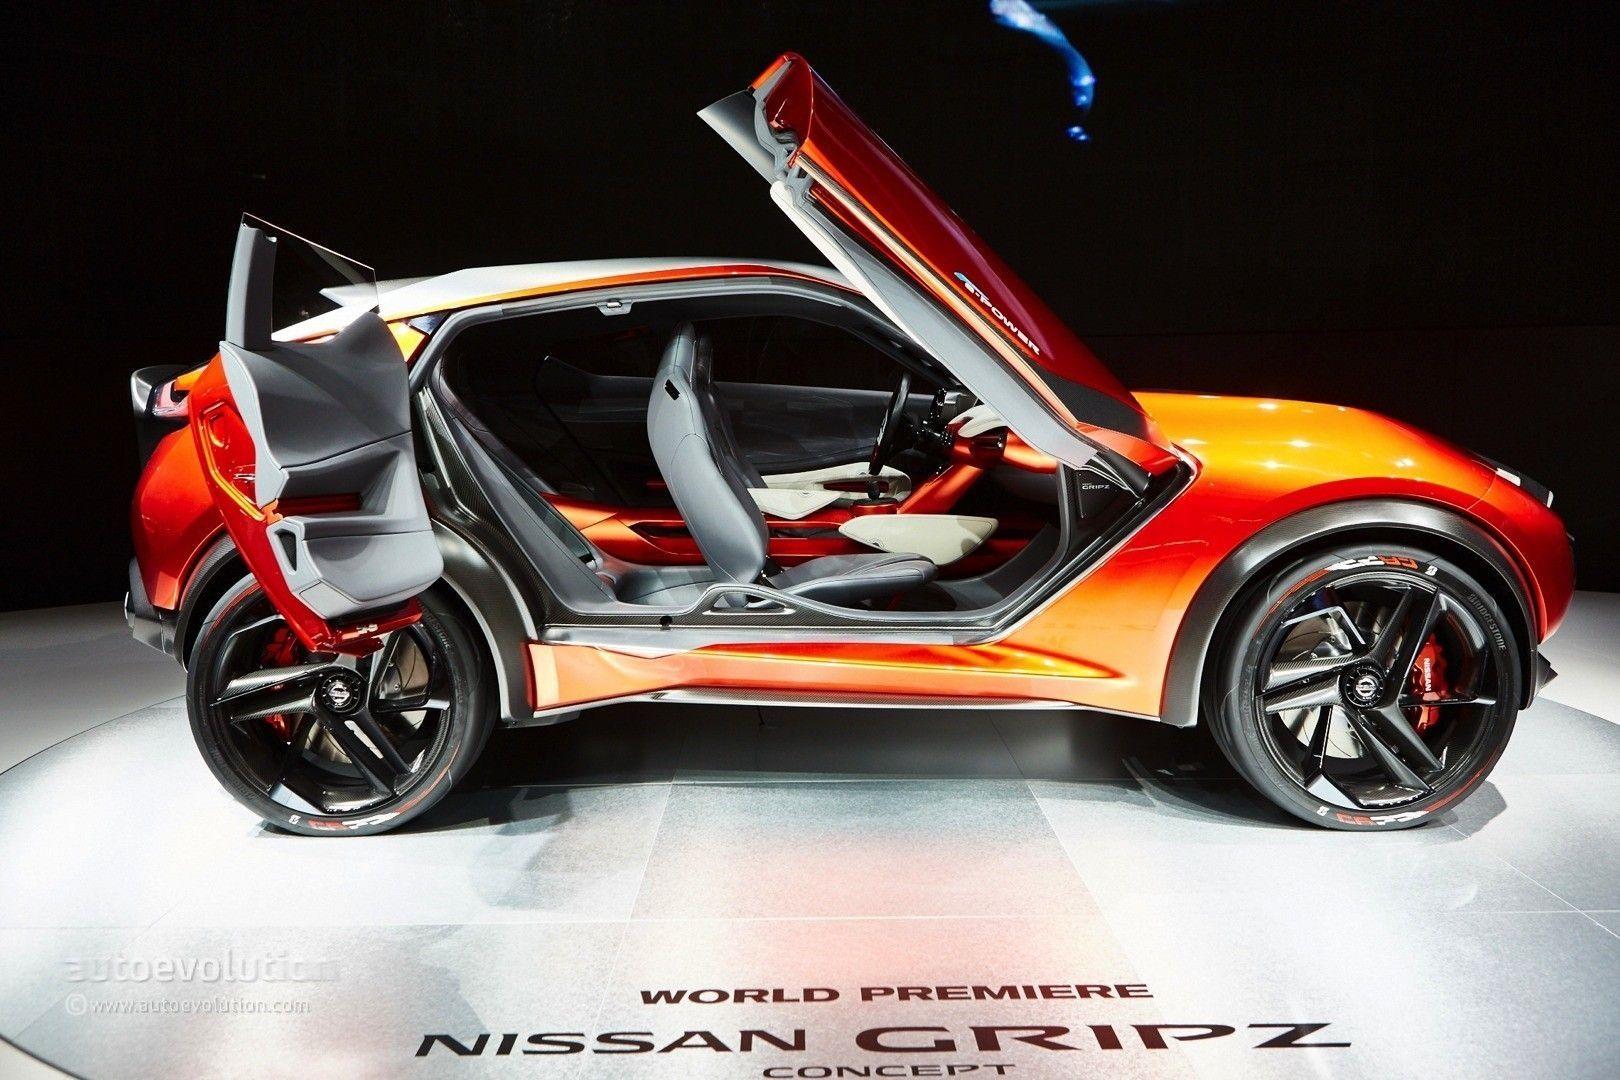 2020 Nissan Juke Specs, New Engine, Changes >> New Nissan Juke 2020 Overview Car Wallpaper Nissan Juke